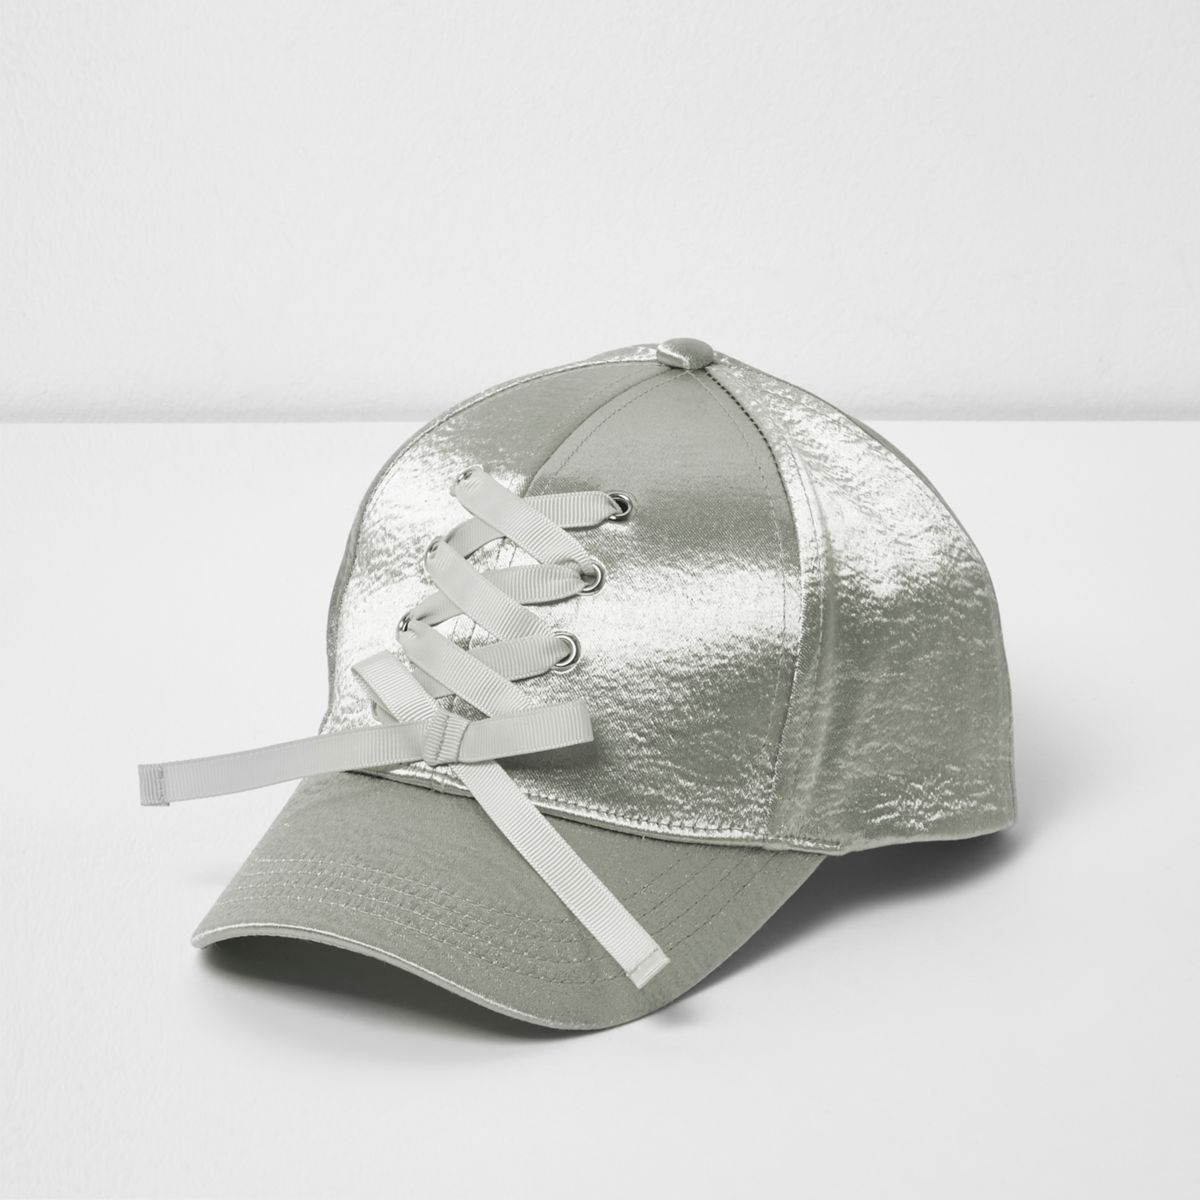 Girls silver satin lace-up baseball cap